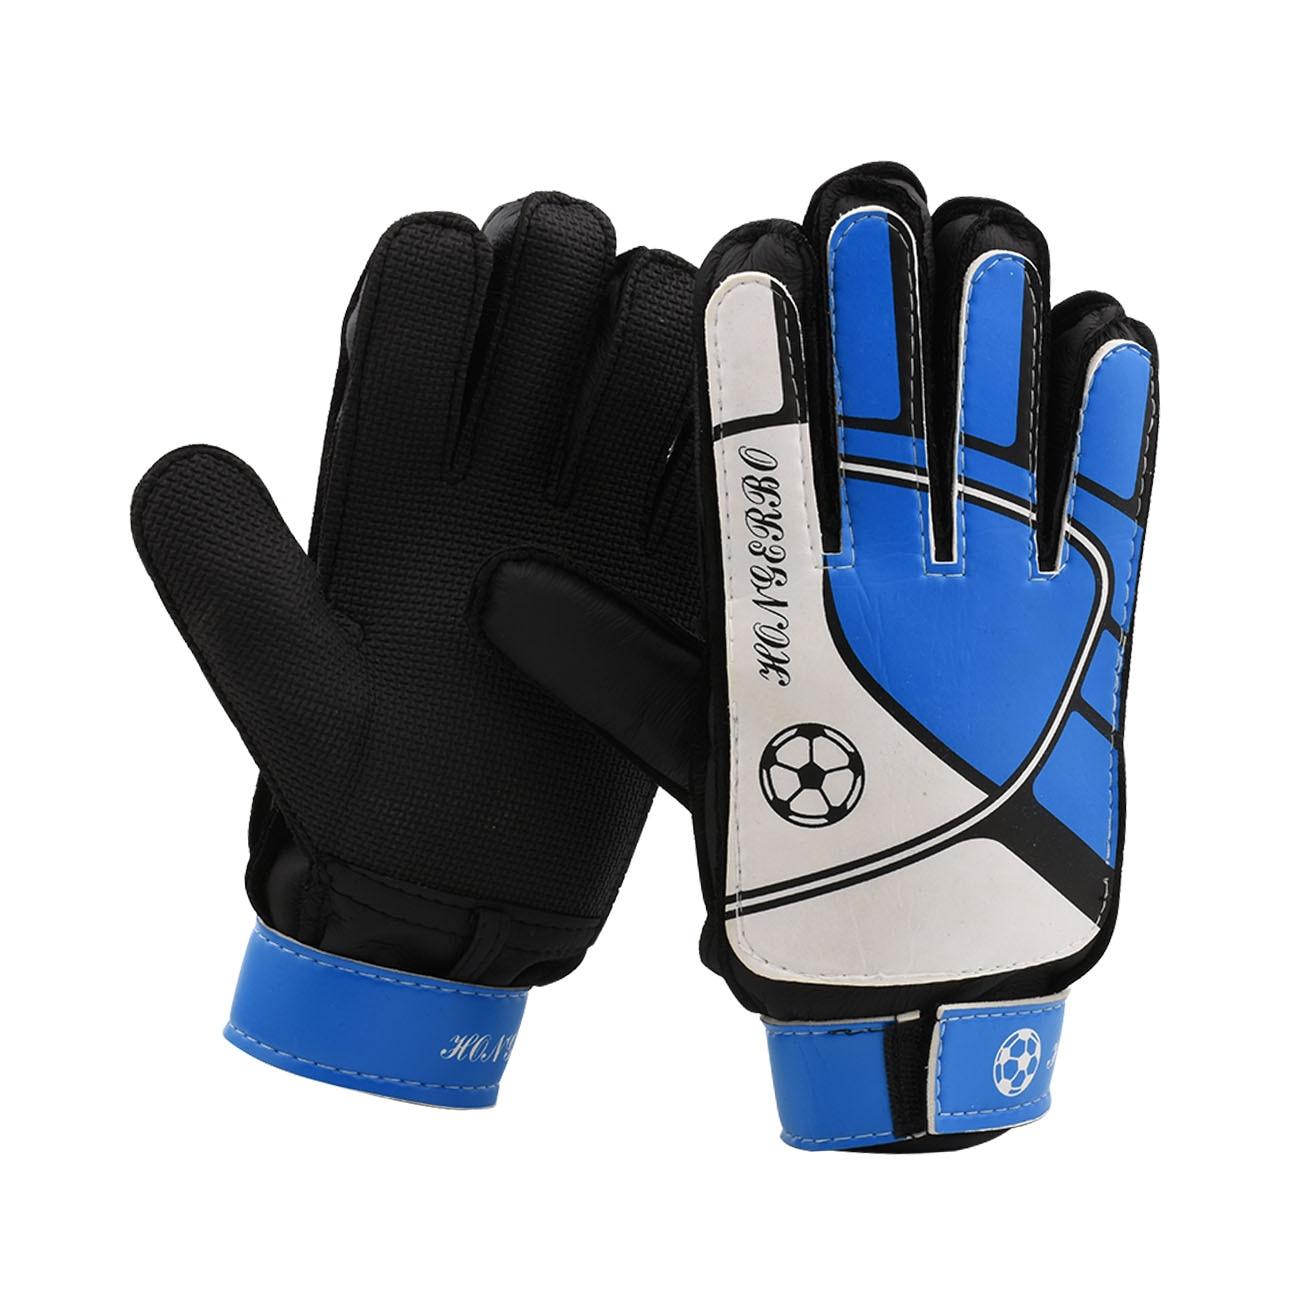 Professional Football Goalkeeper Gloves Adults Children Finger Protector Kids Soccer Goalie Gloves Latex Strong Finger Save Gear